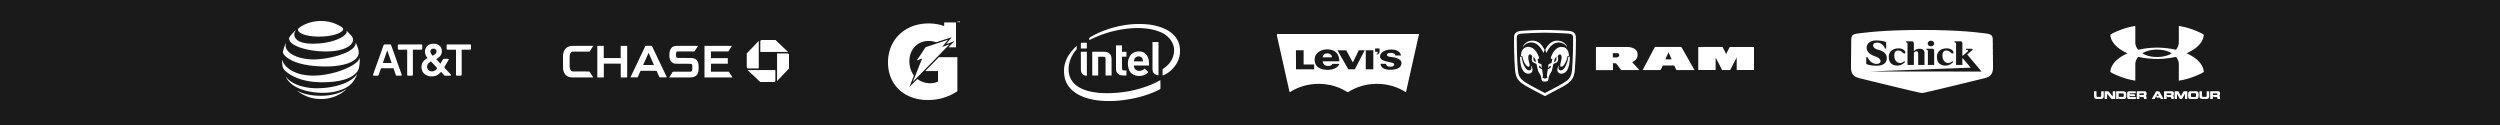 DLP_About_Logos(BrandedEntertainment).jpg